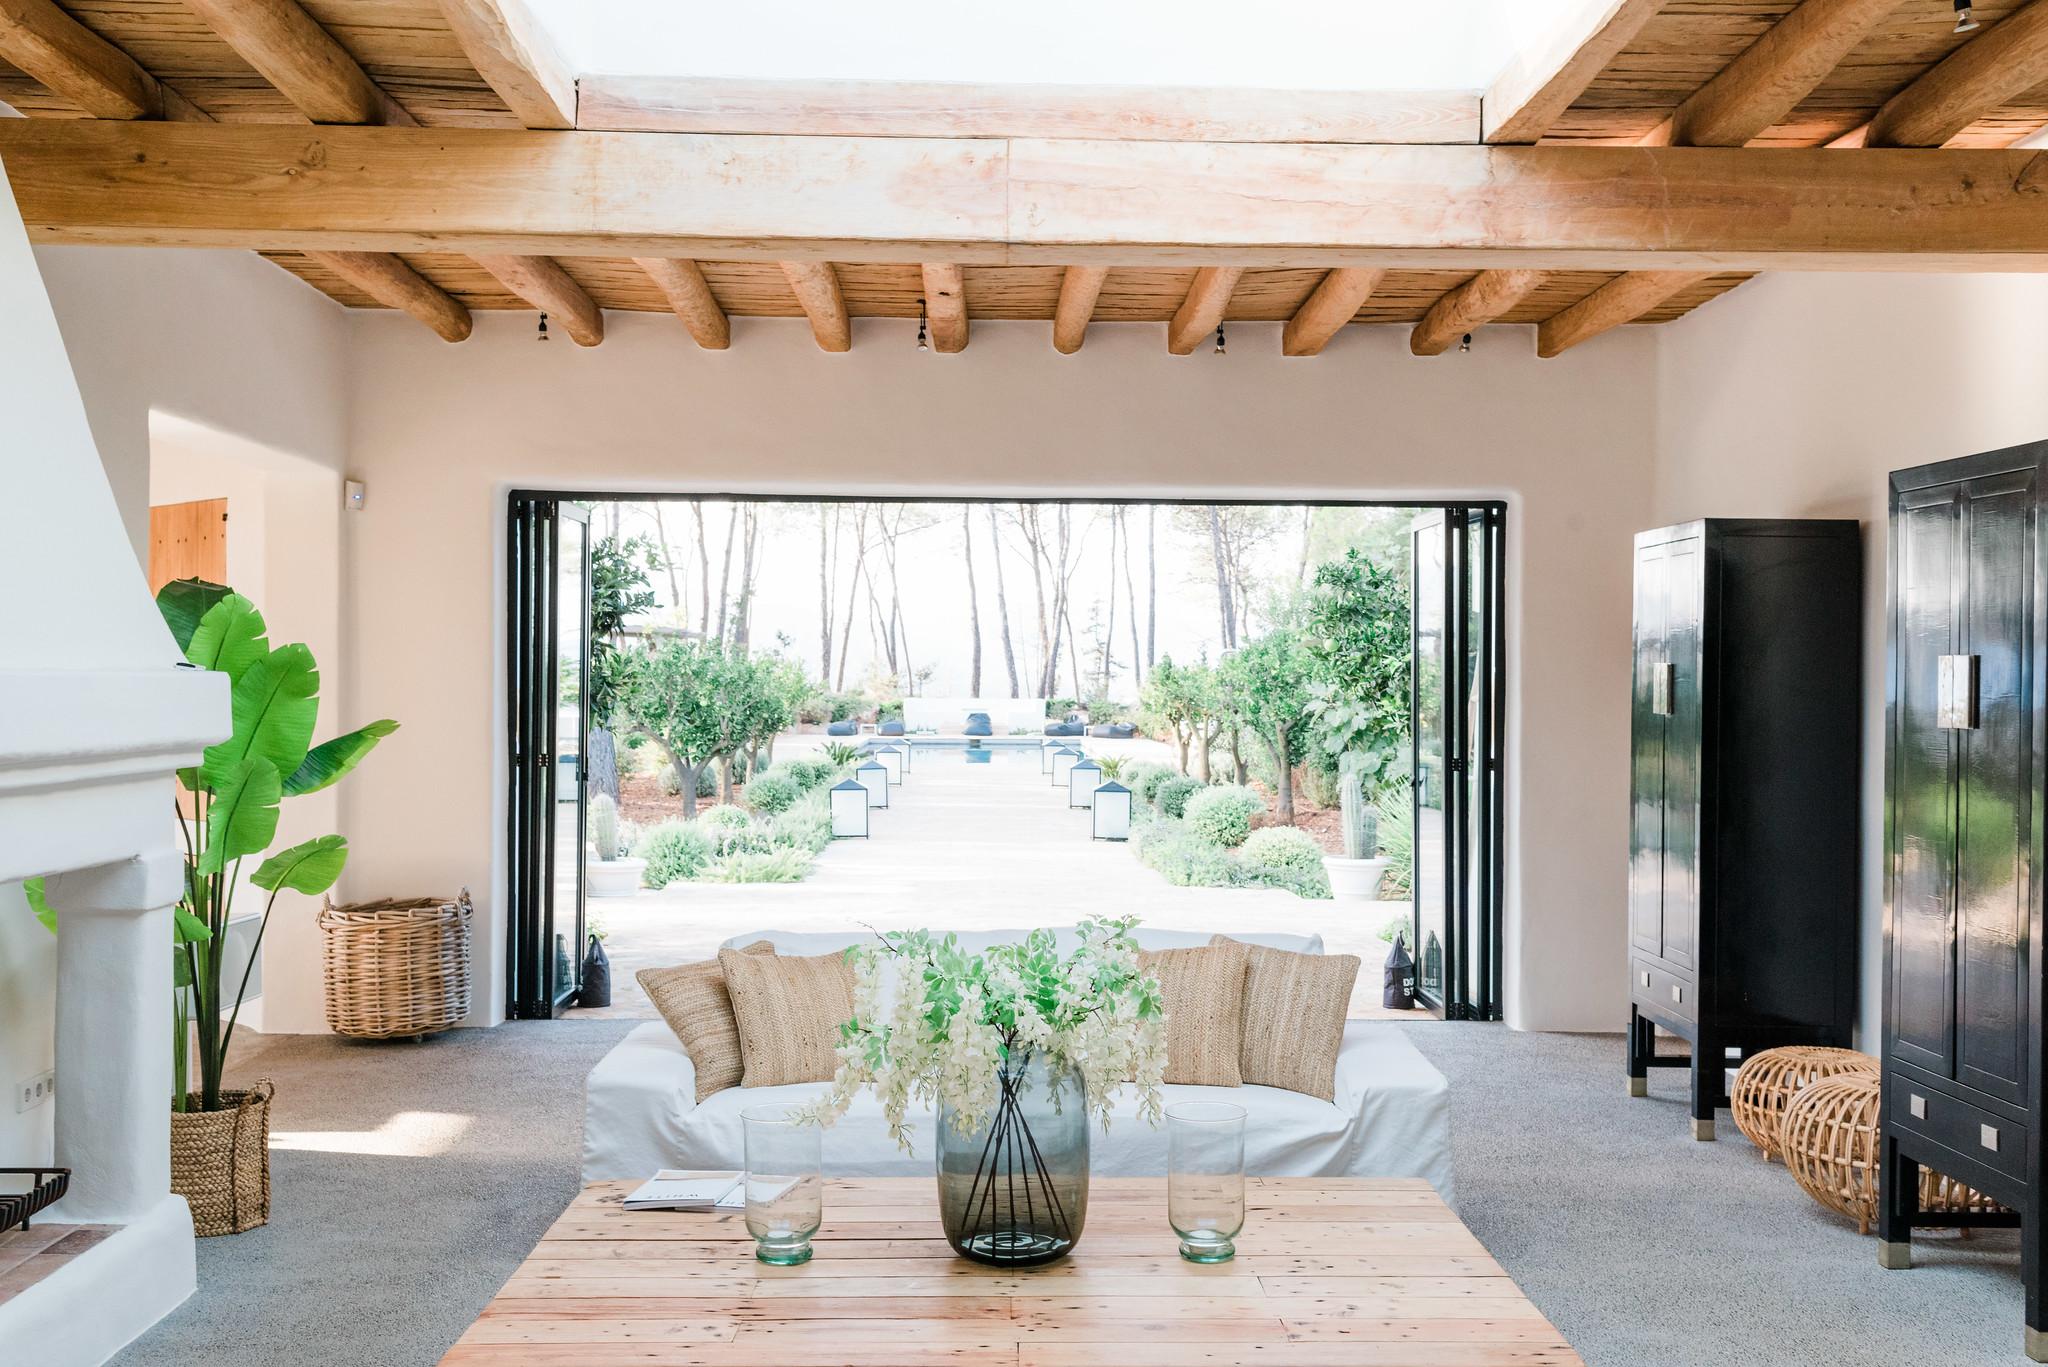 https://www.white-ibiza.com/wp-content/uploads/2020/05/white-ibiza-villas-can-terra-view-from-lounge.jpg